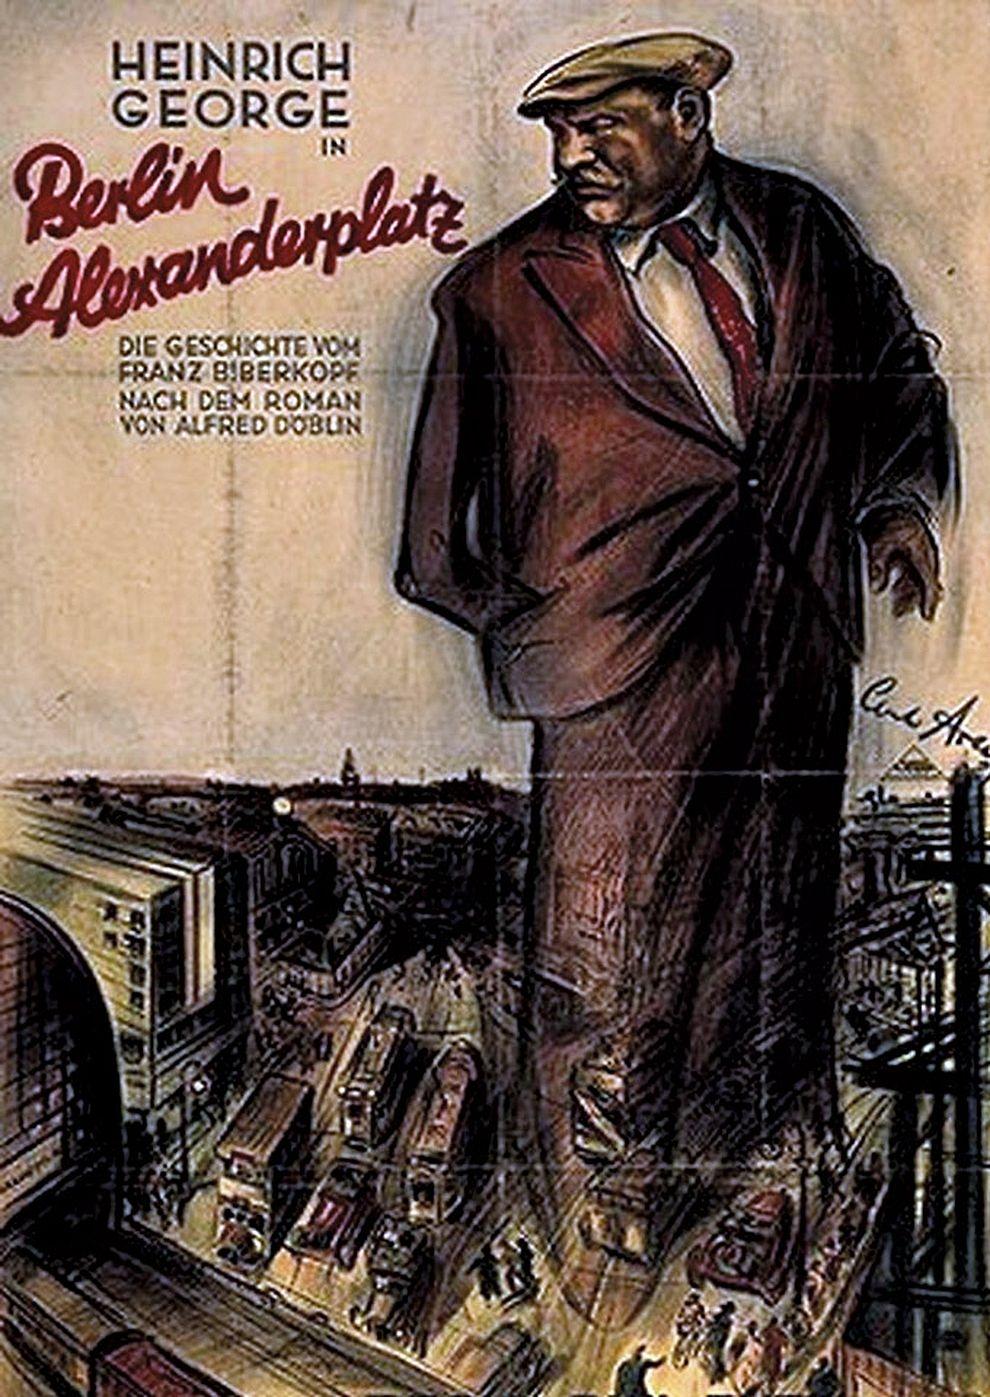 Berlin - Alexanderplatz (Poster)